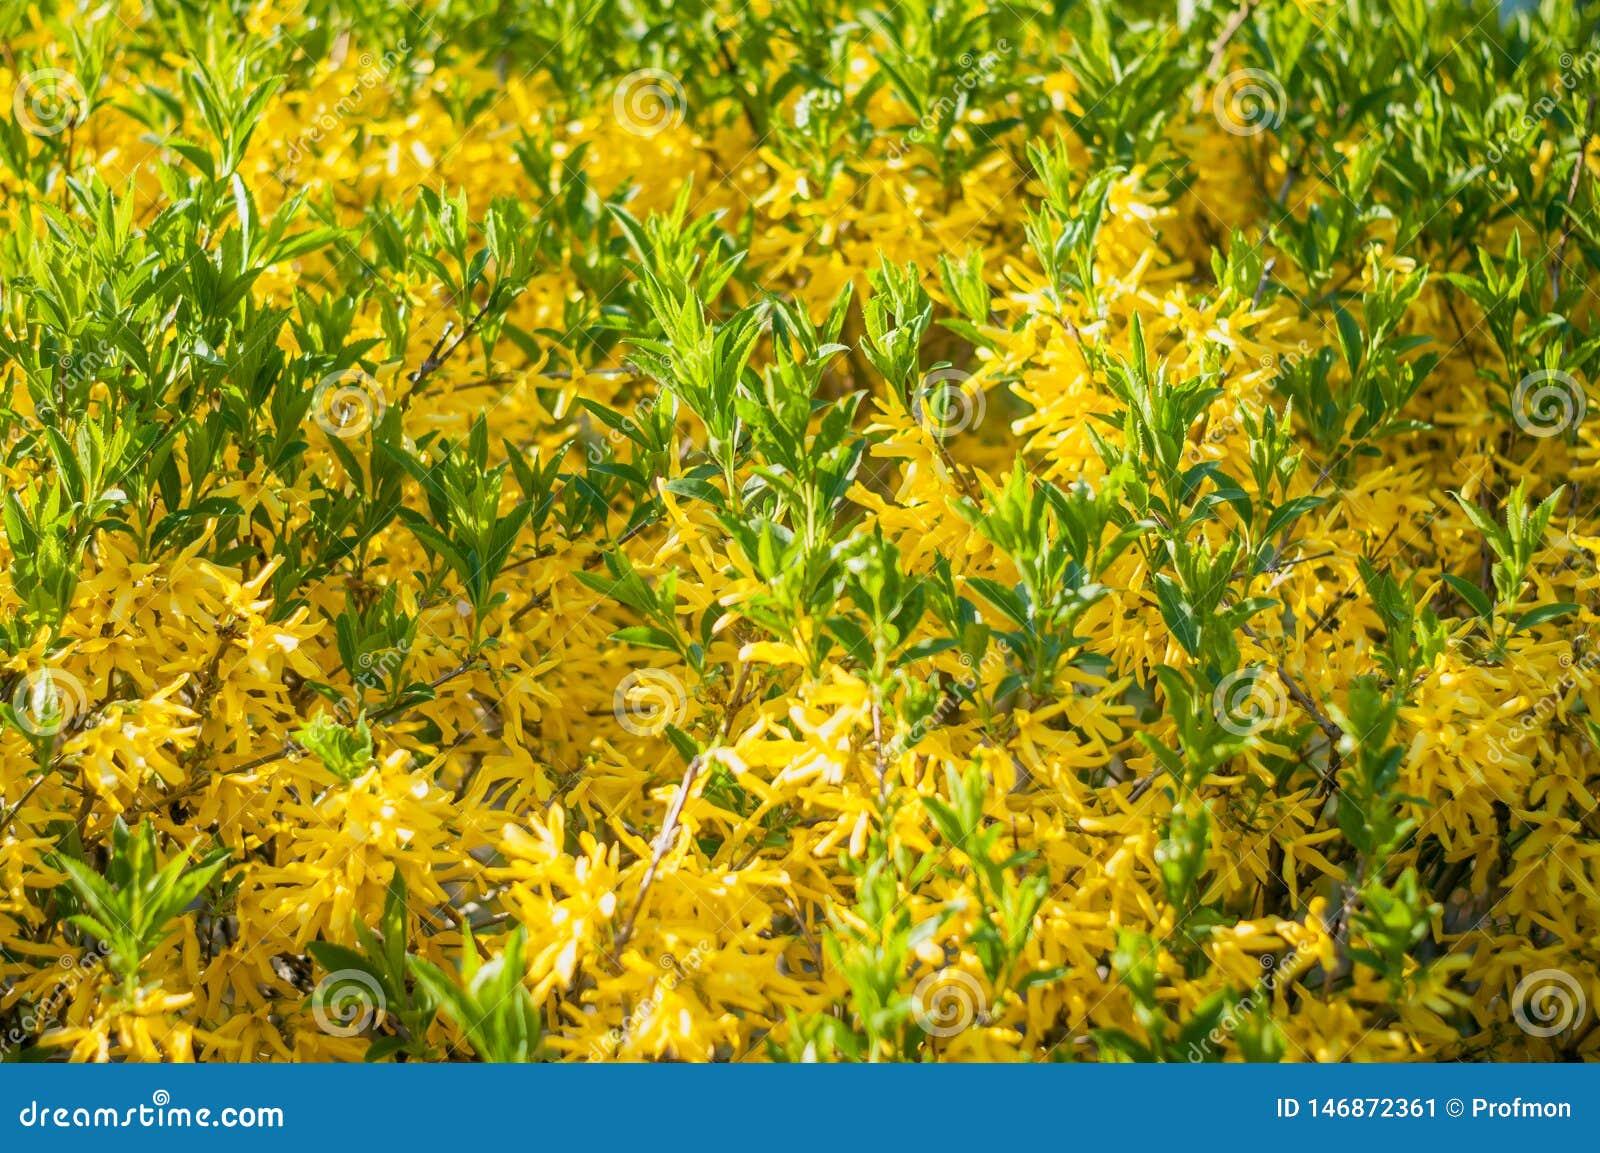 Forsythia Low Shrub Having Bright Yellow Flowers In Spring Stock